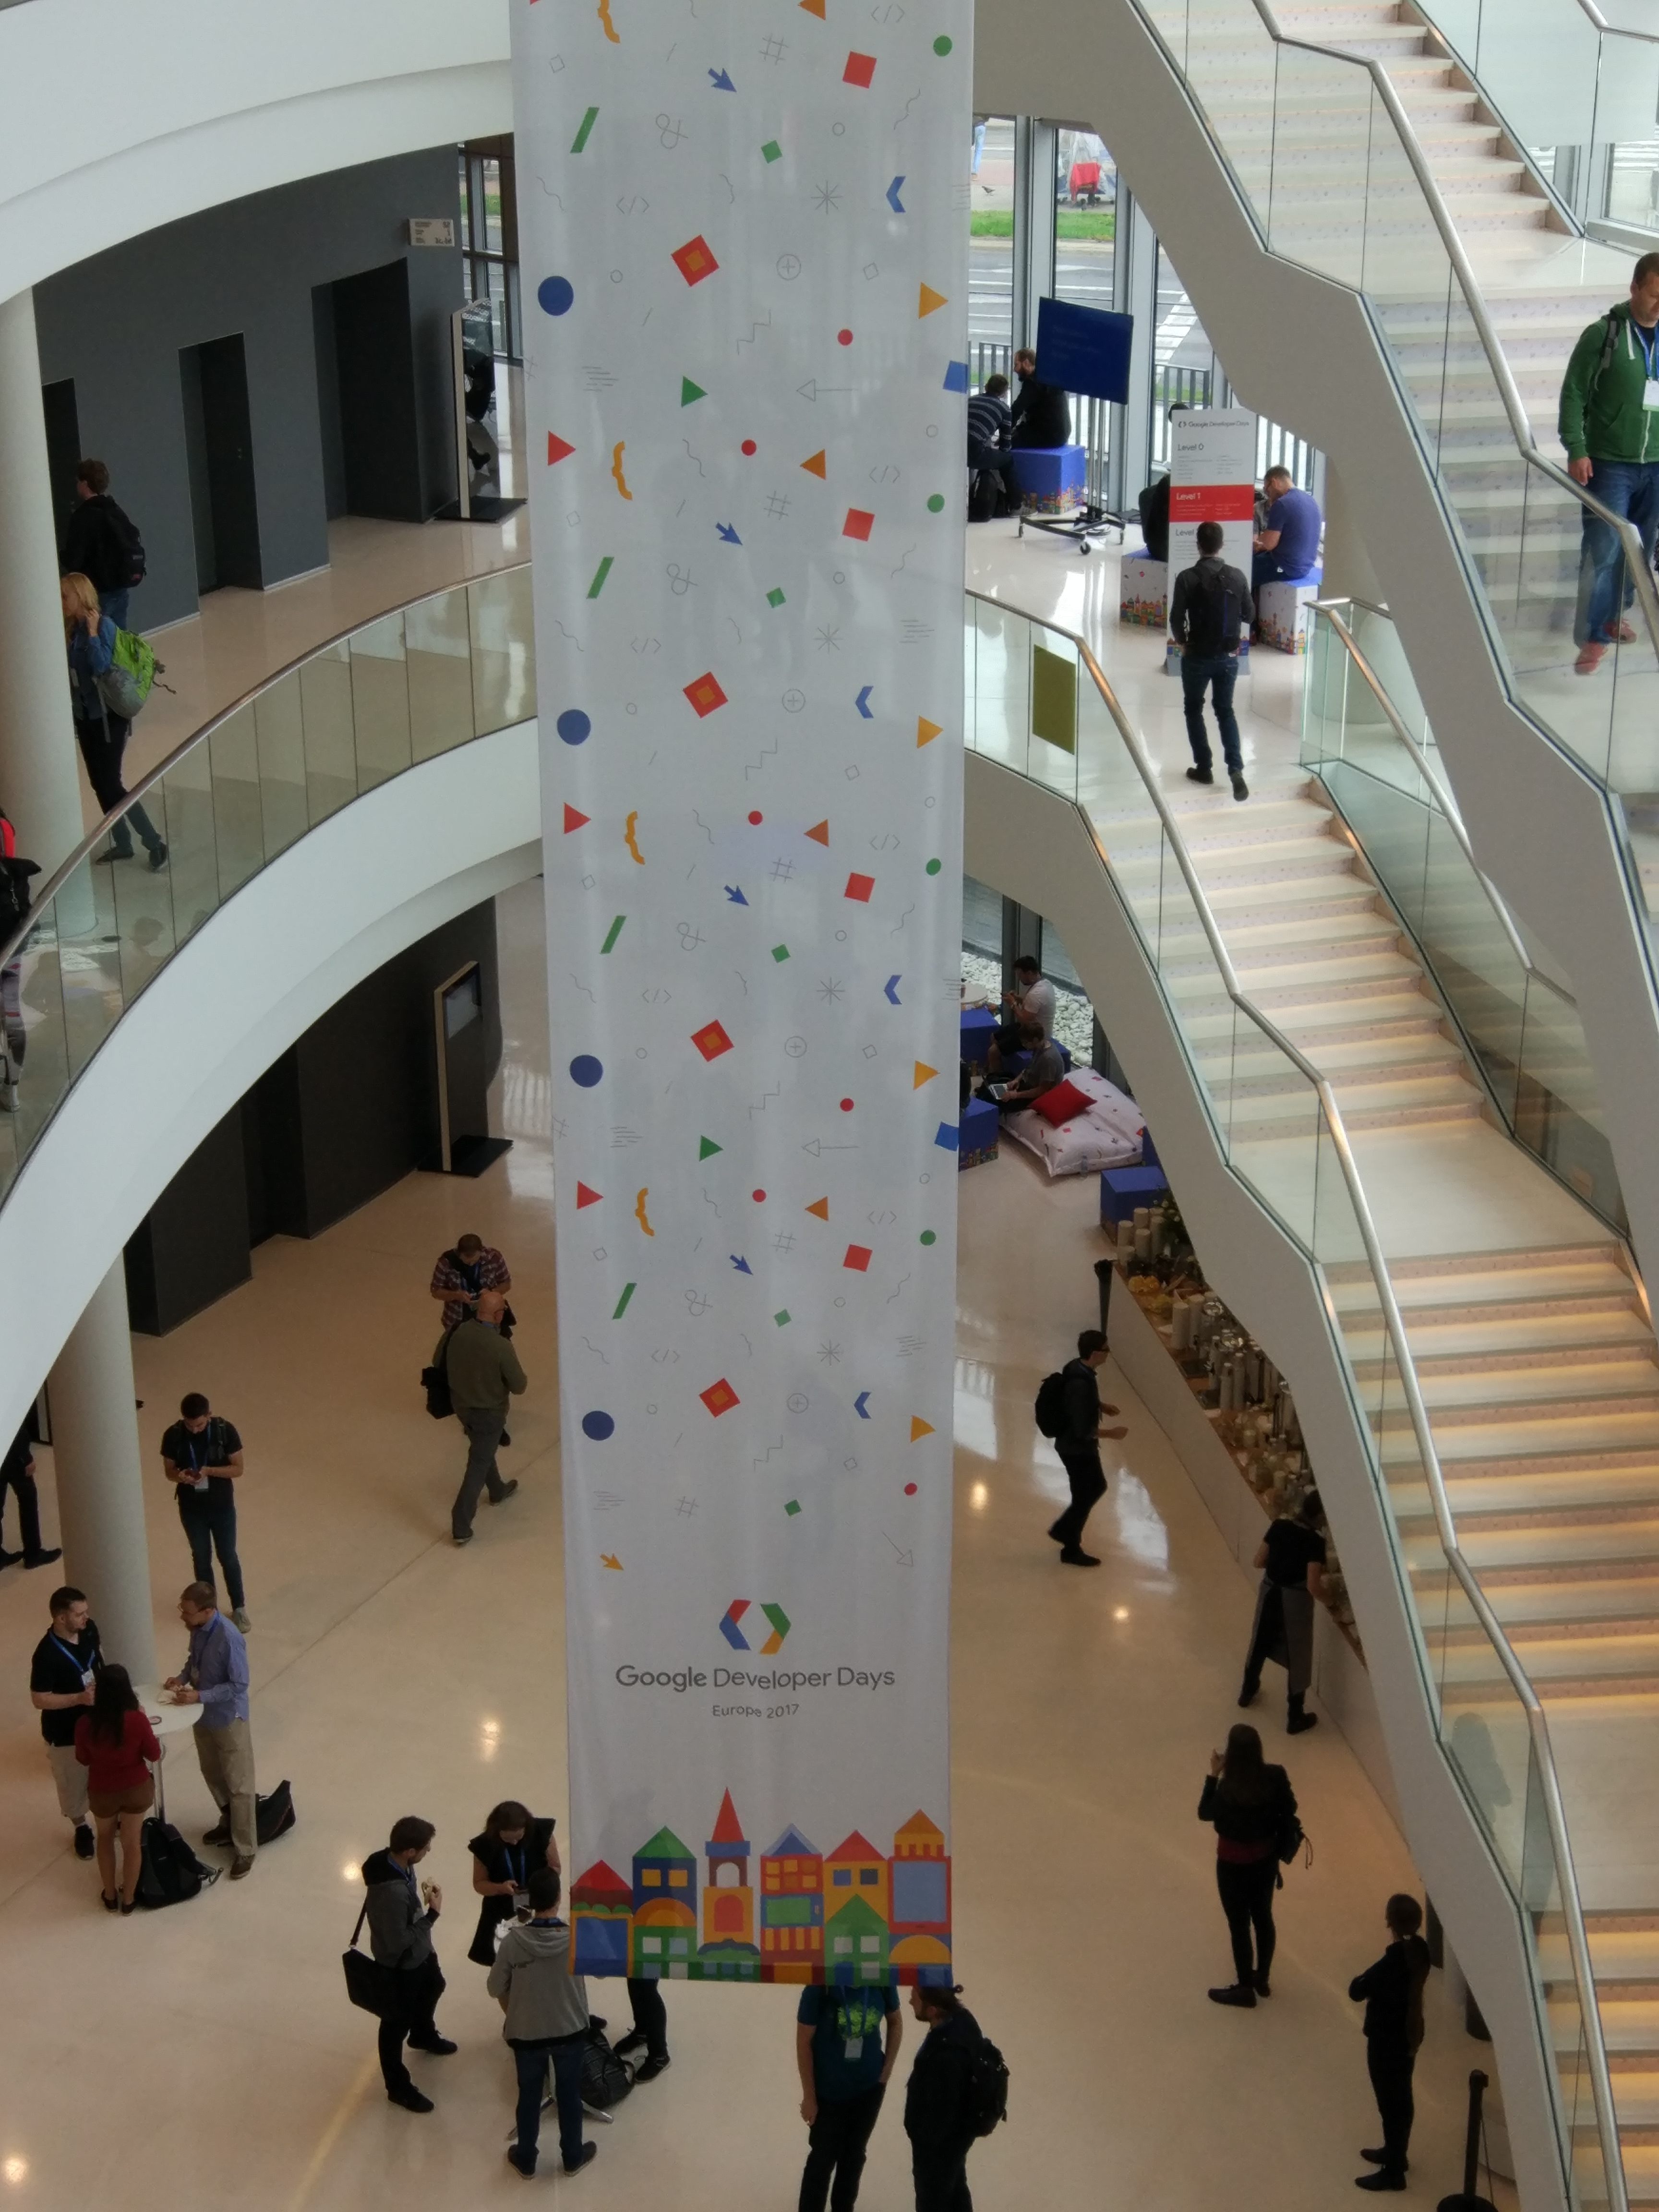 Webové technológie, machine learning či augmented reality: ako bolo na Google Developer Days v Krakowe? 7